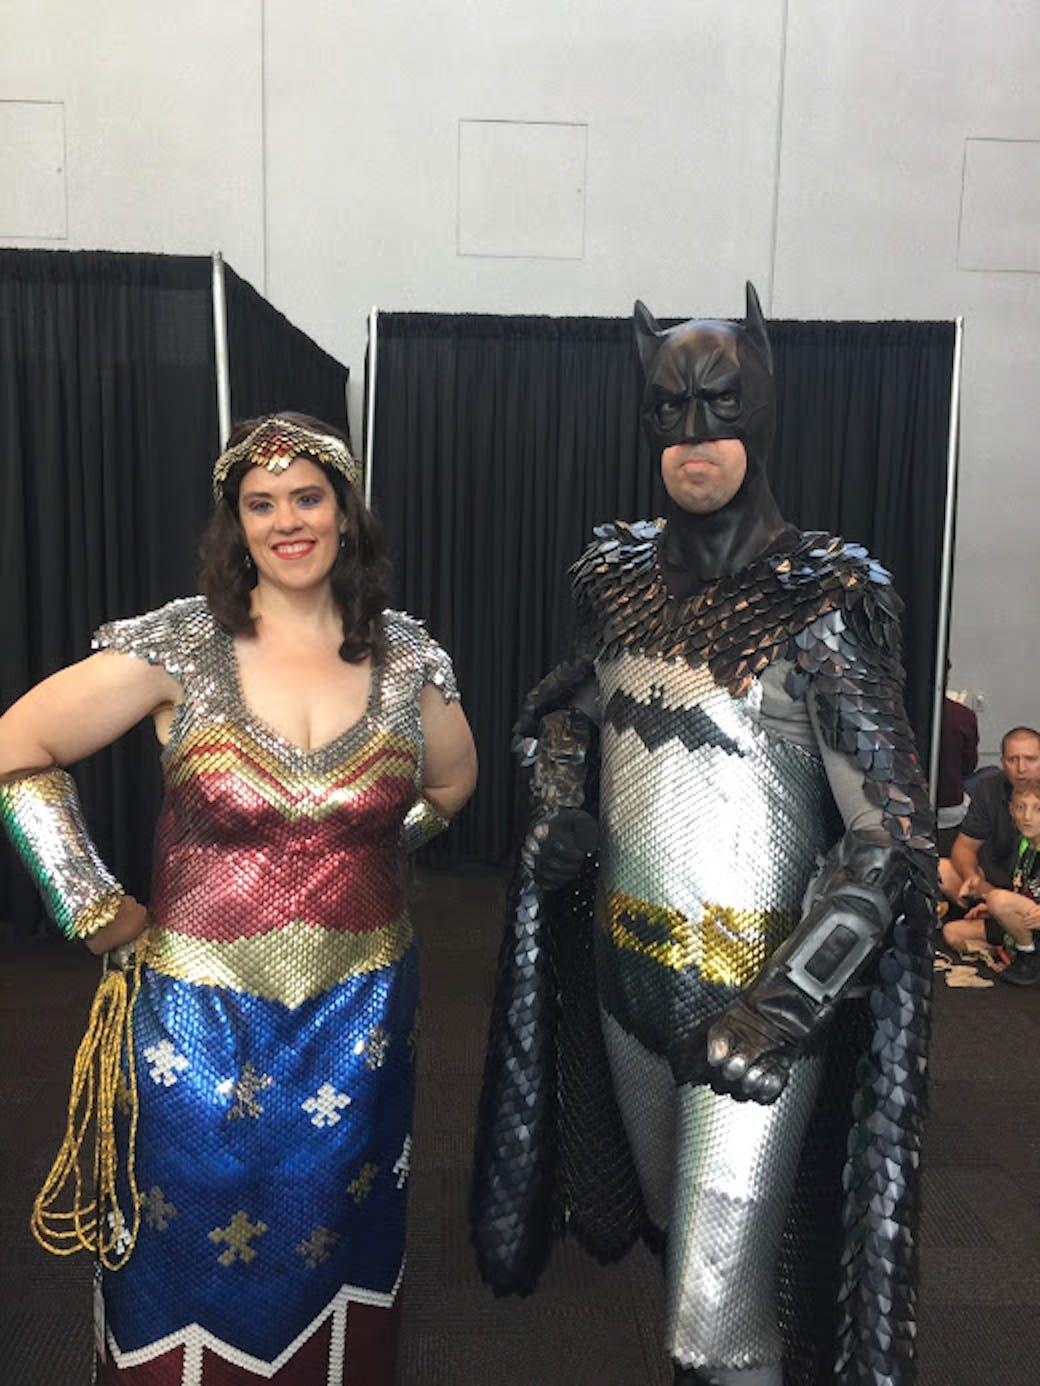 nycc cosplay batman wonder woman